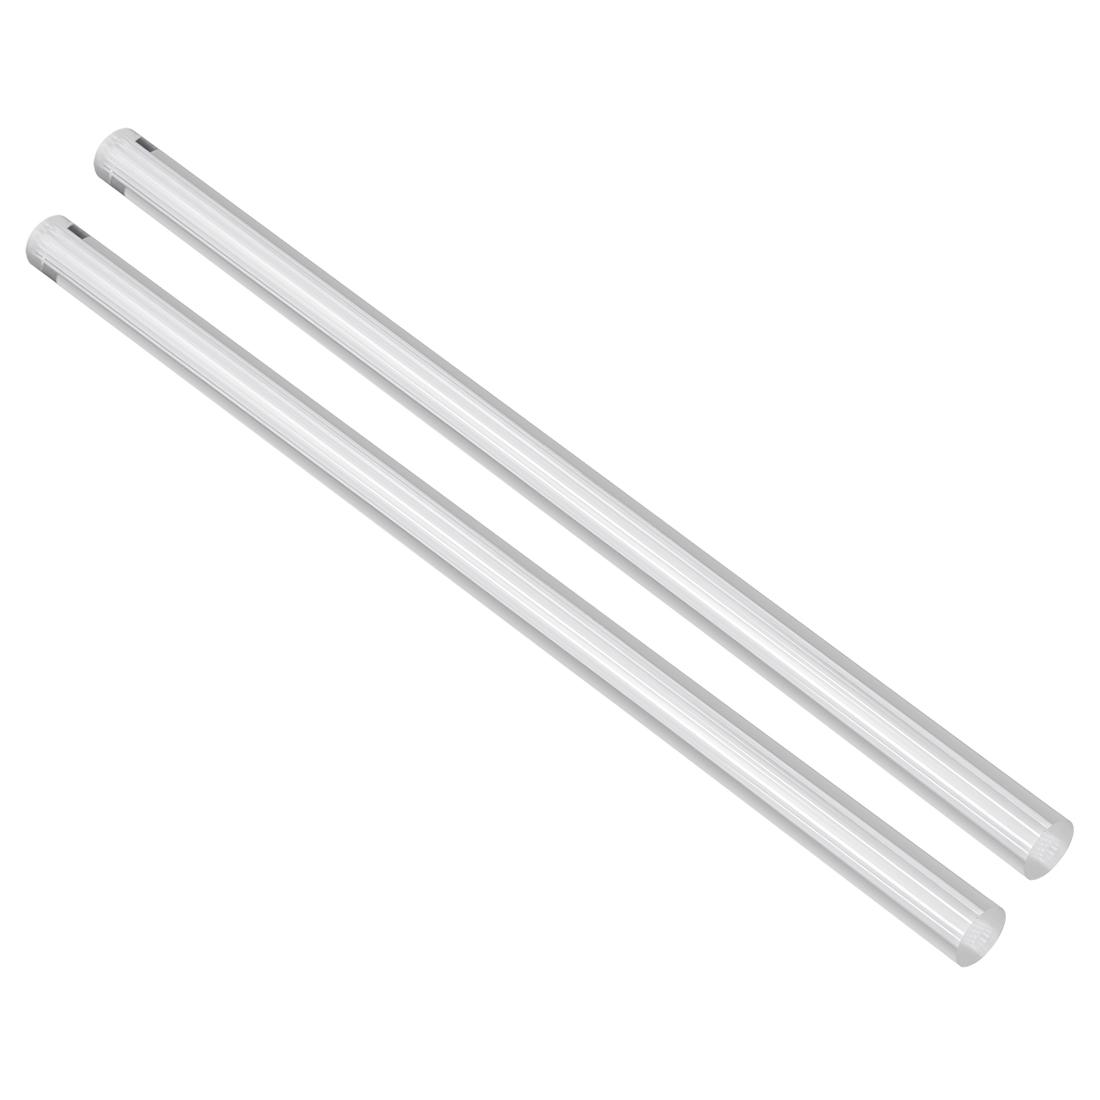 Solid Acrylic Round Rod Straight Light White Line PMMA Bar 12mmx250mm 2Pcs